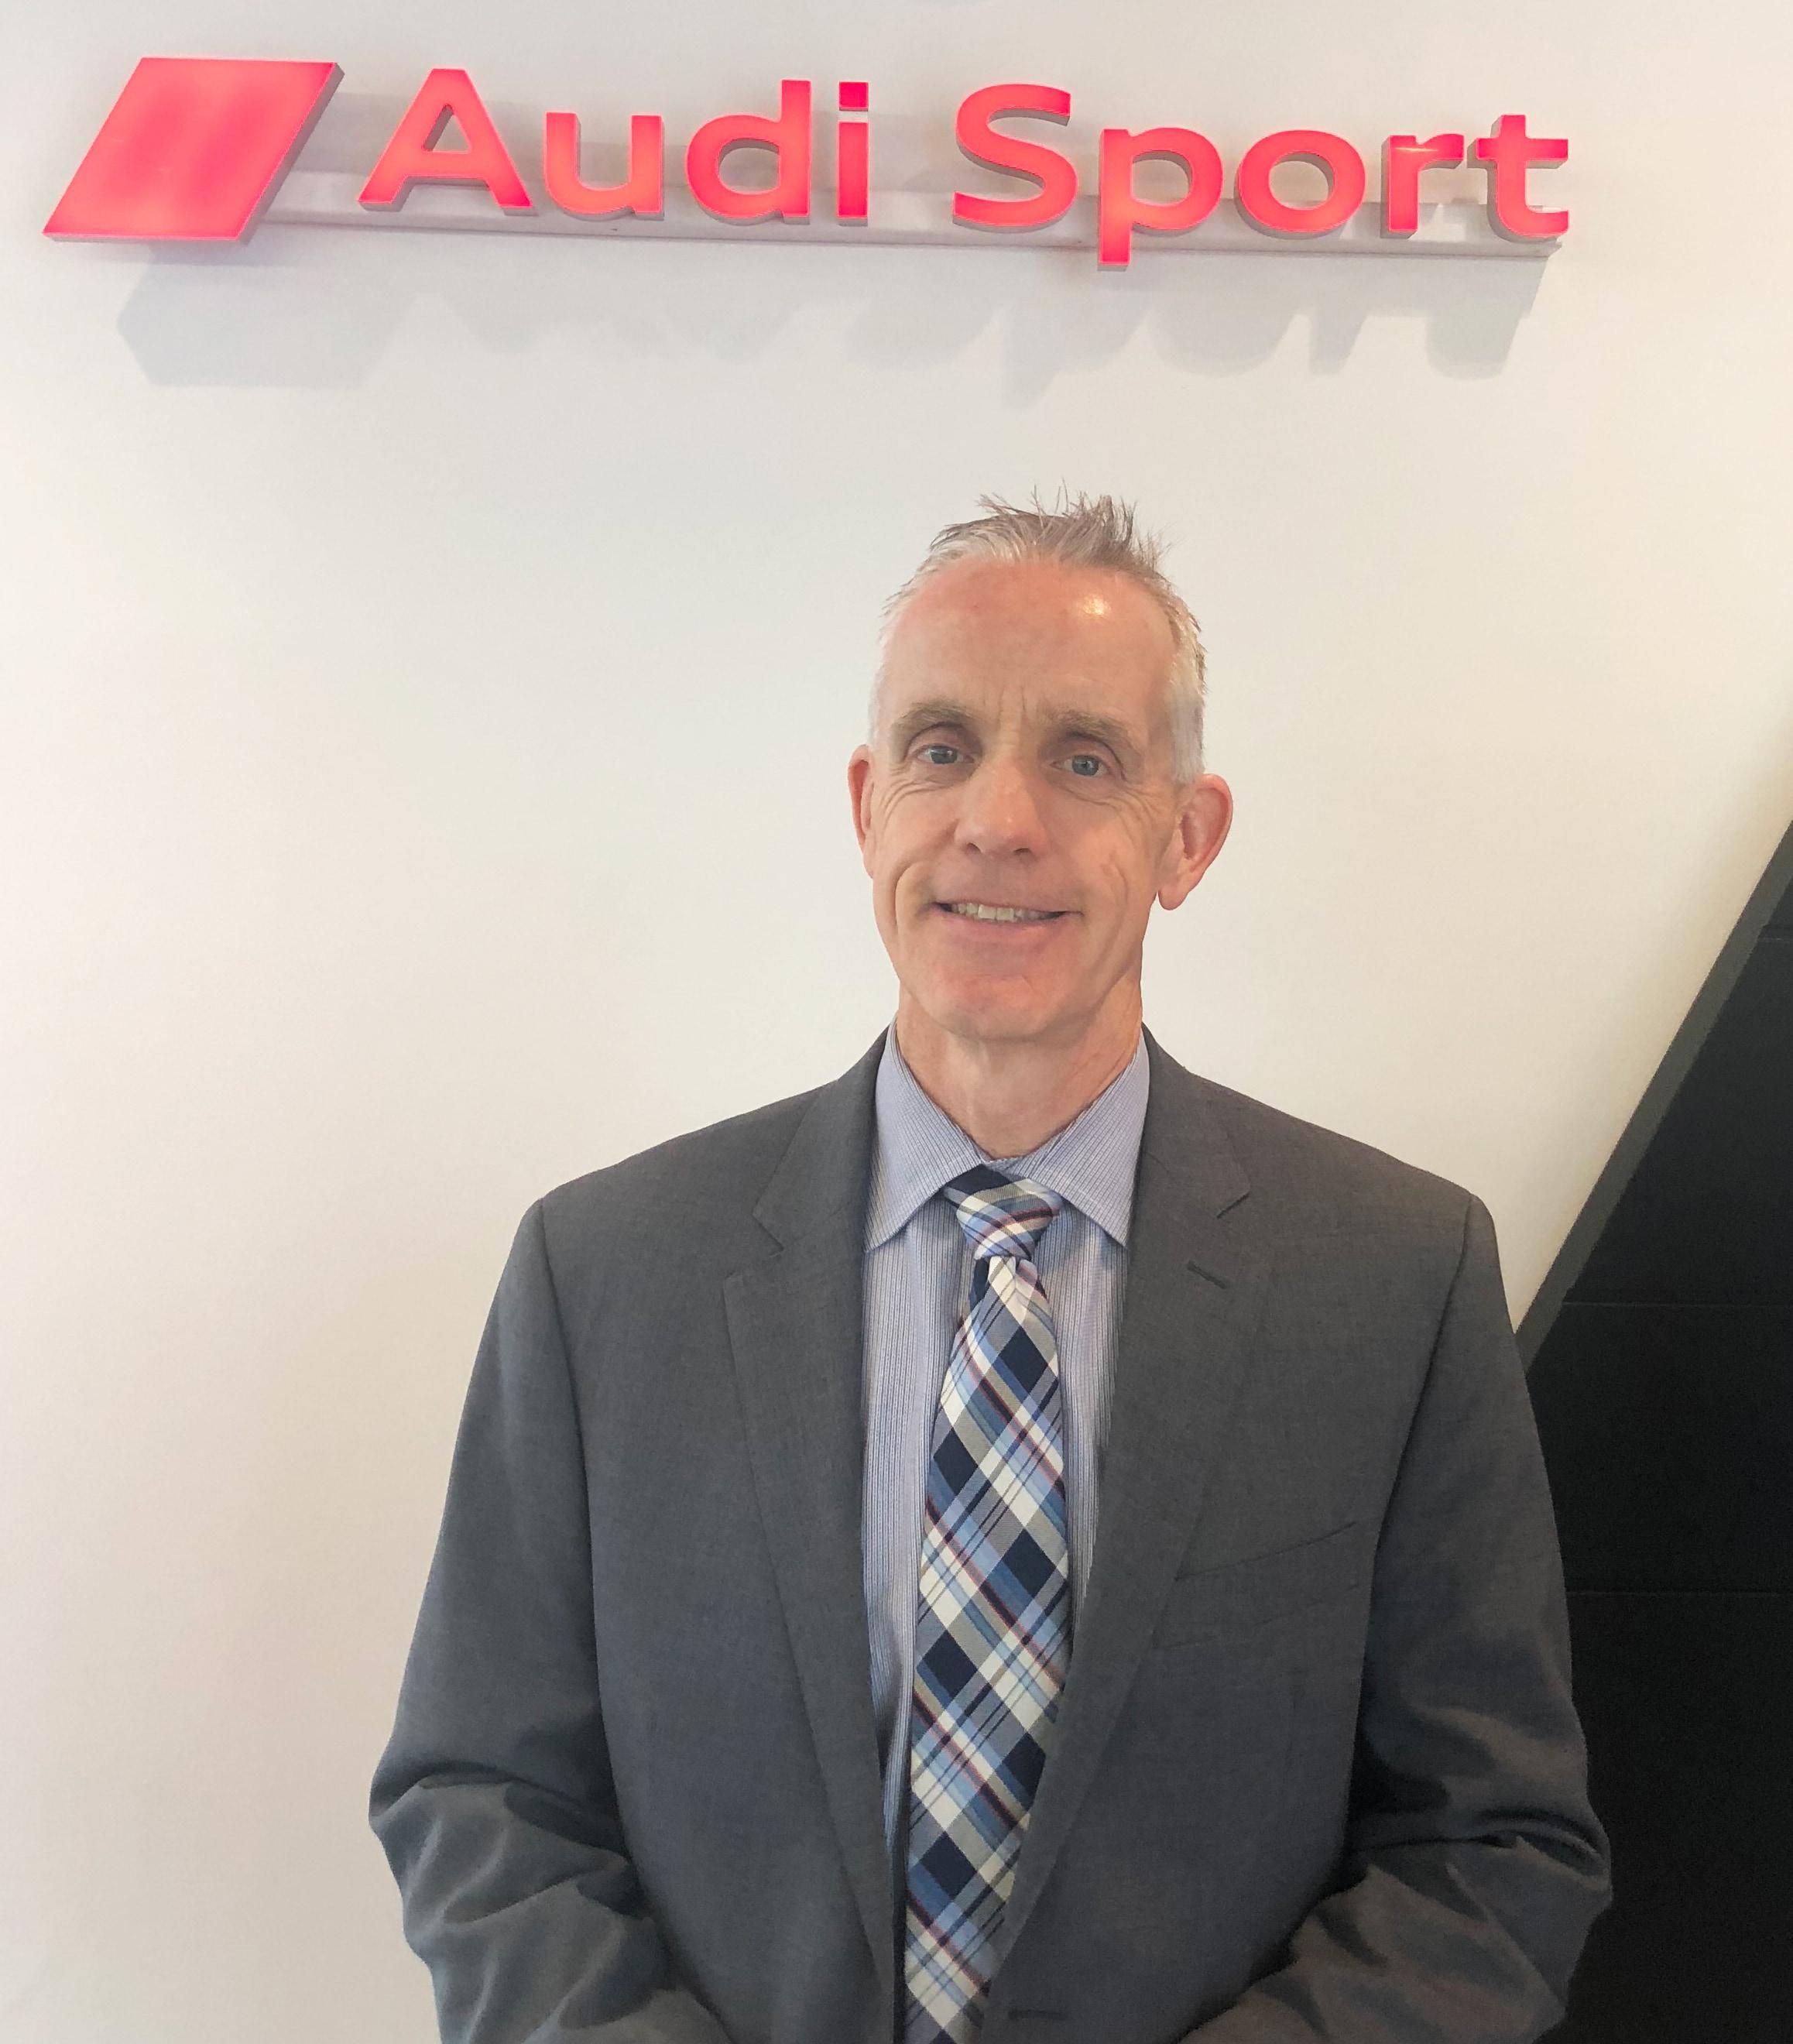 New Audi Dealership In Latham, NY 12110